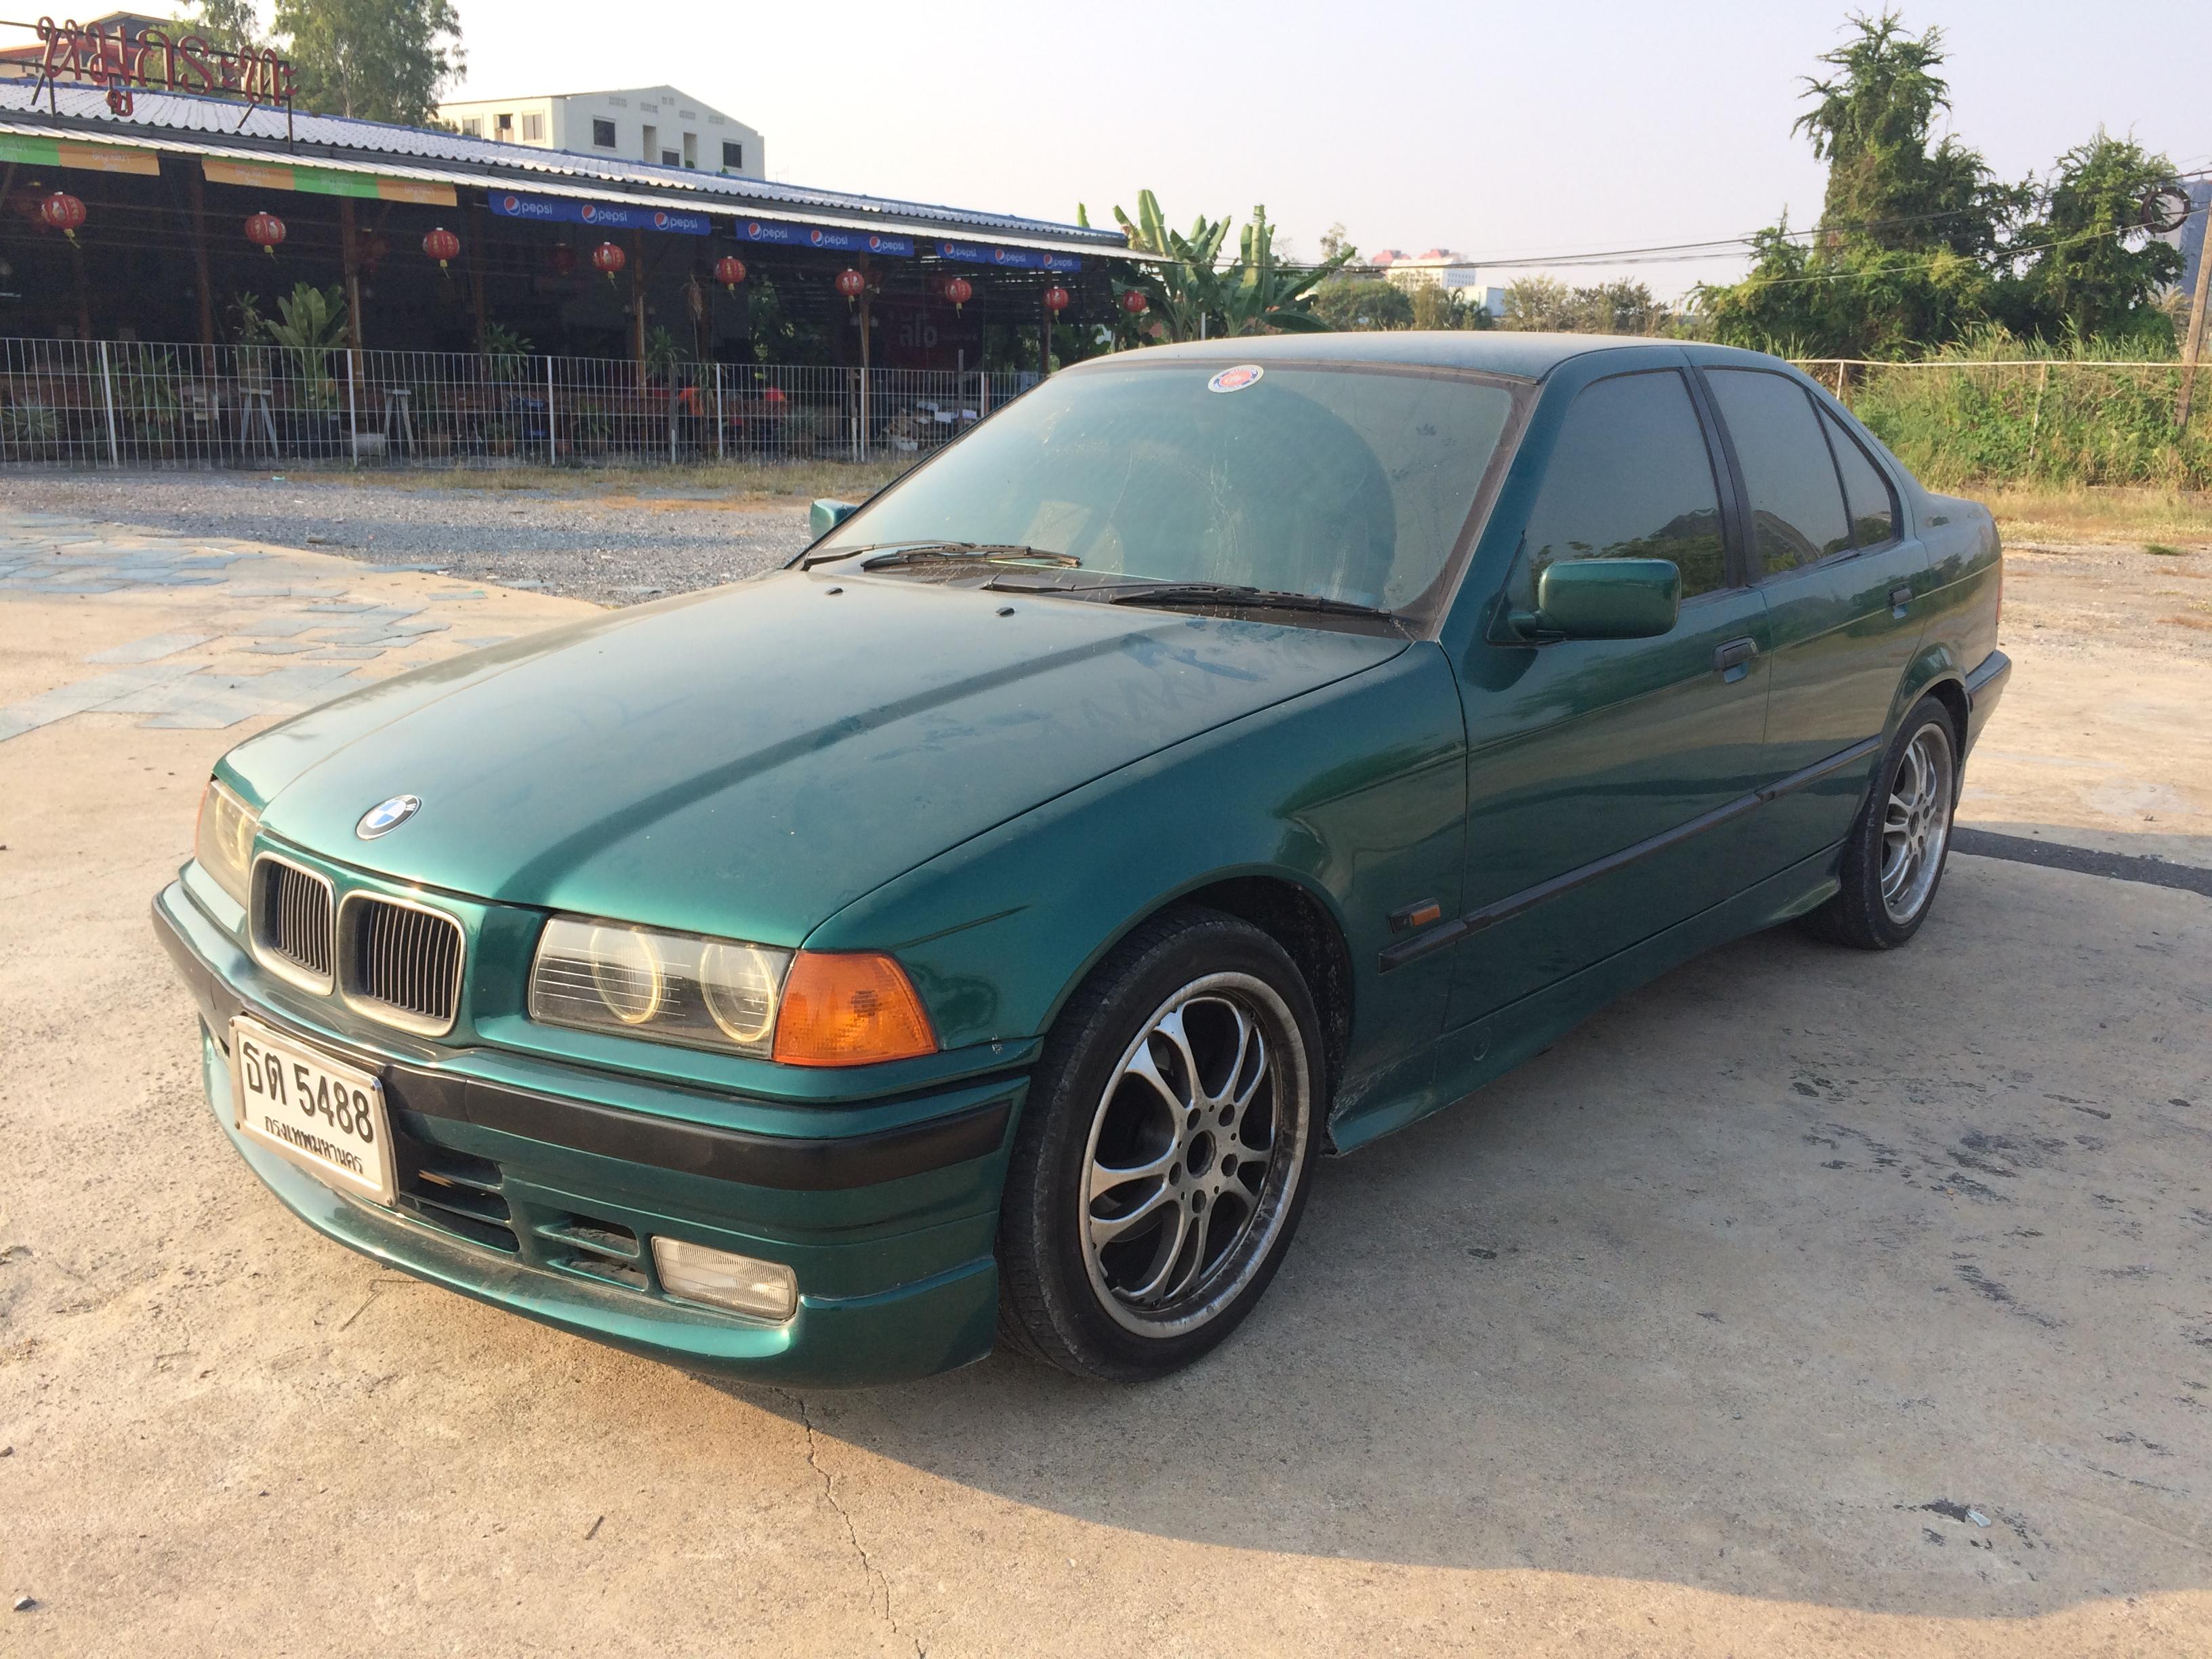 File 1995 1996 Bmw 318i E36 Sedan 22 02 2018 01 Jpg Wikimedia Commons